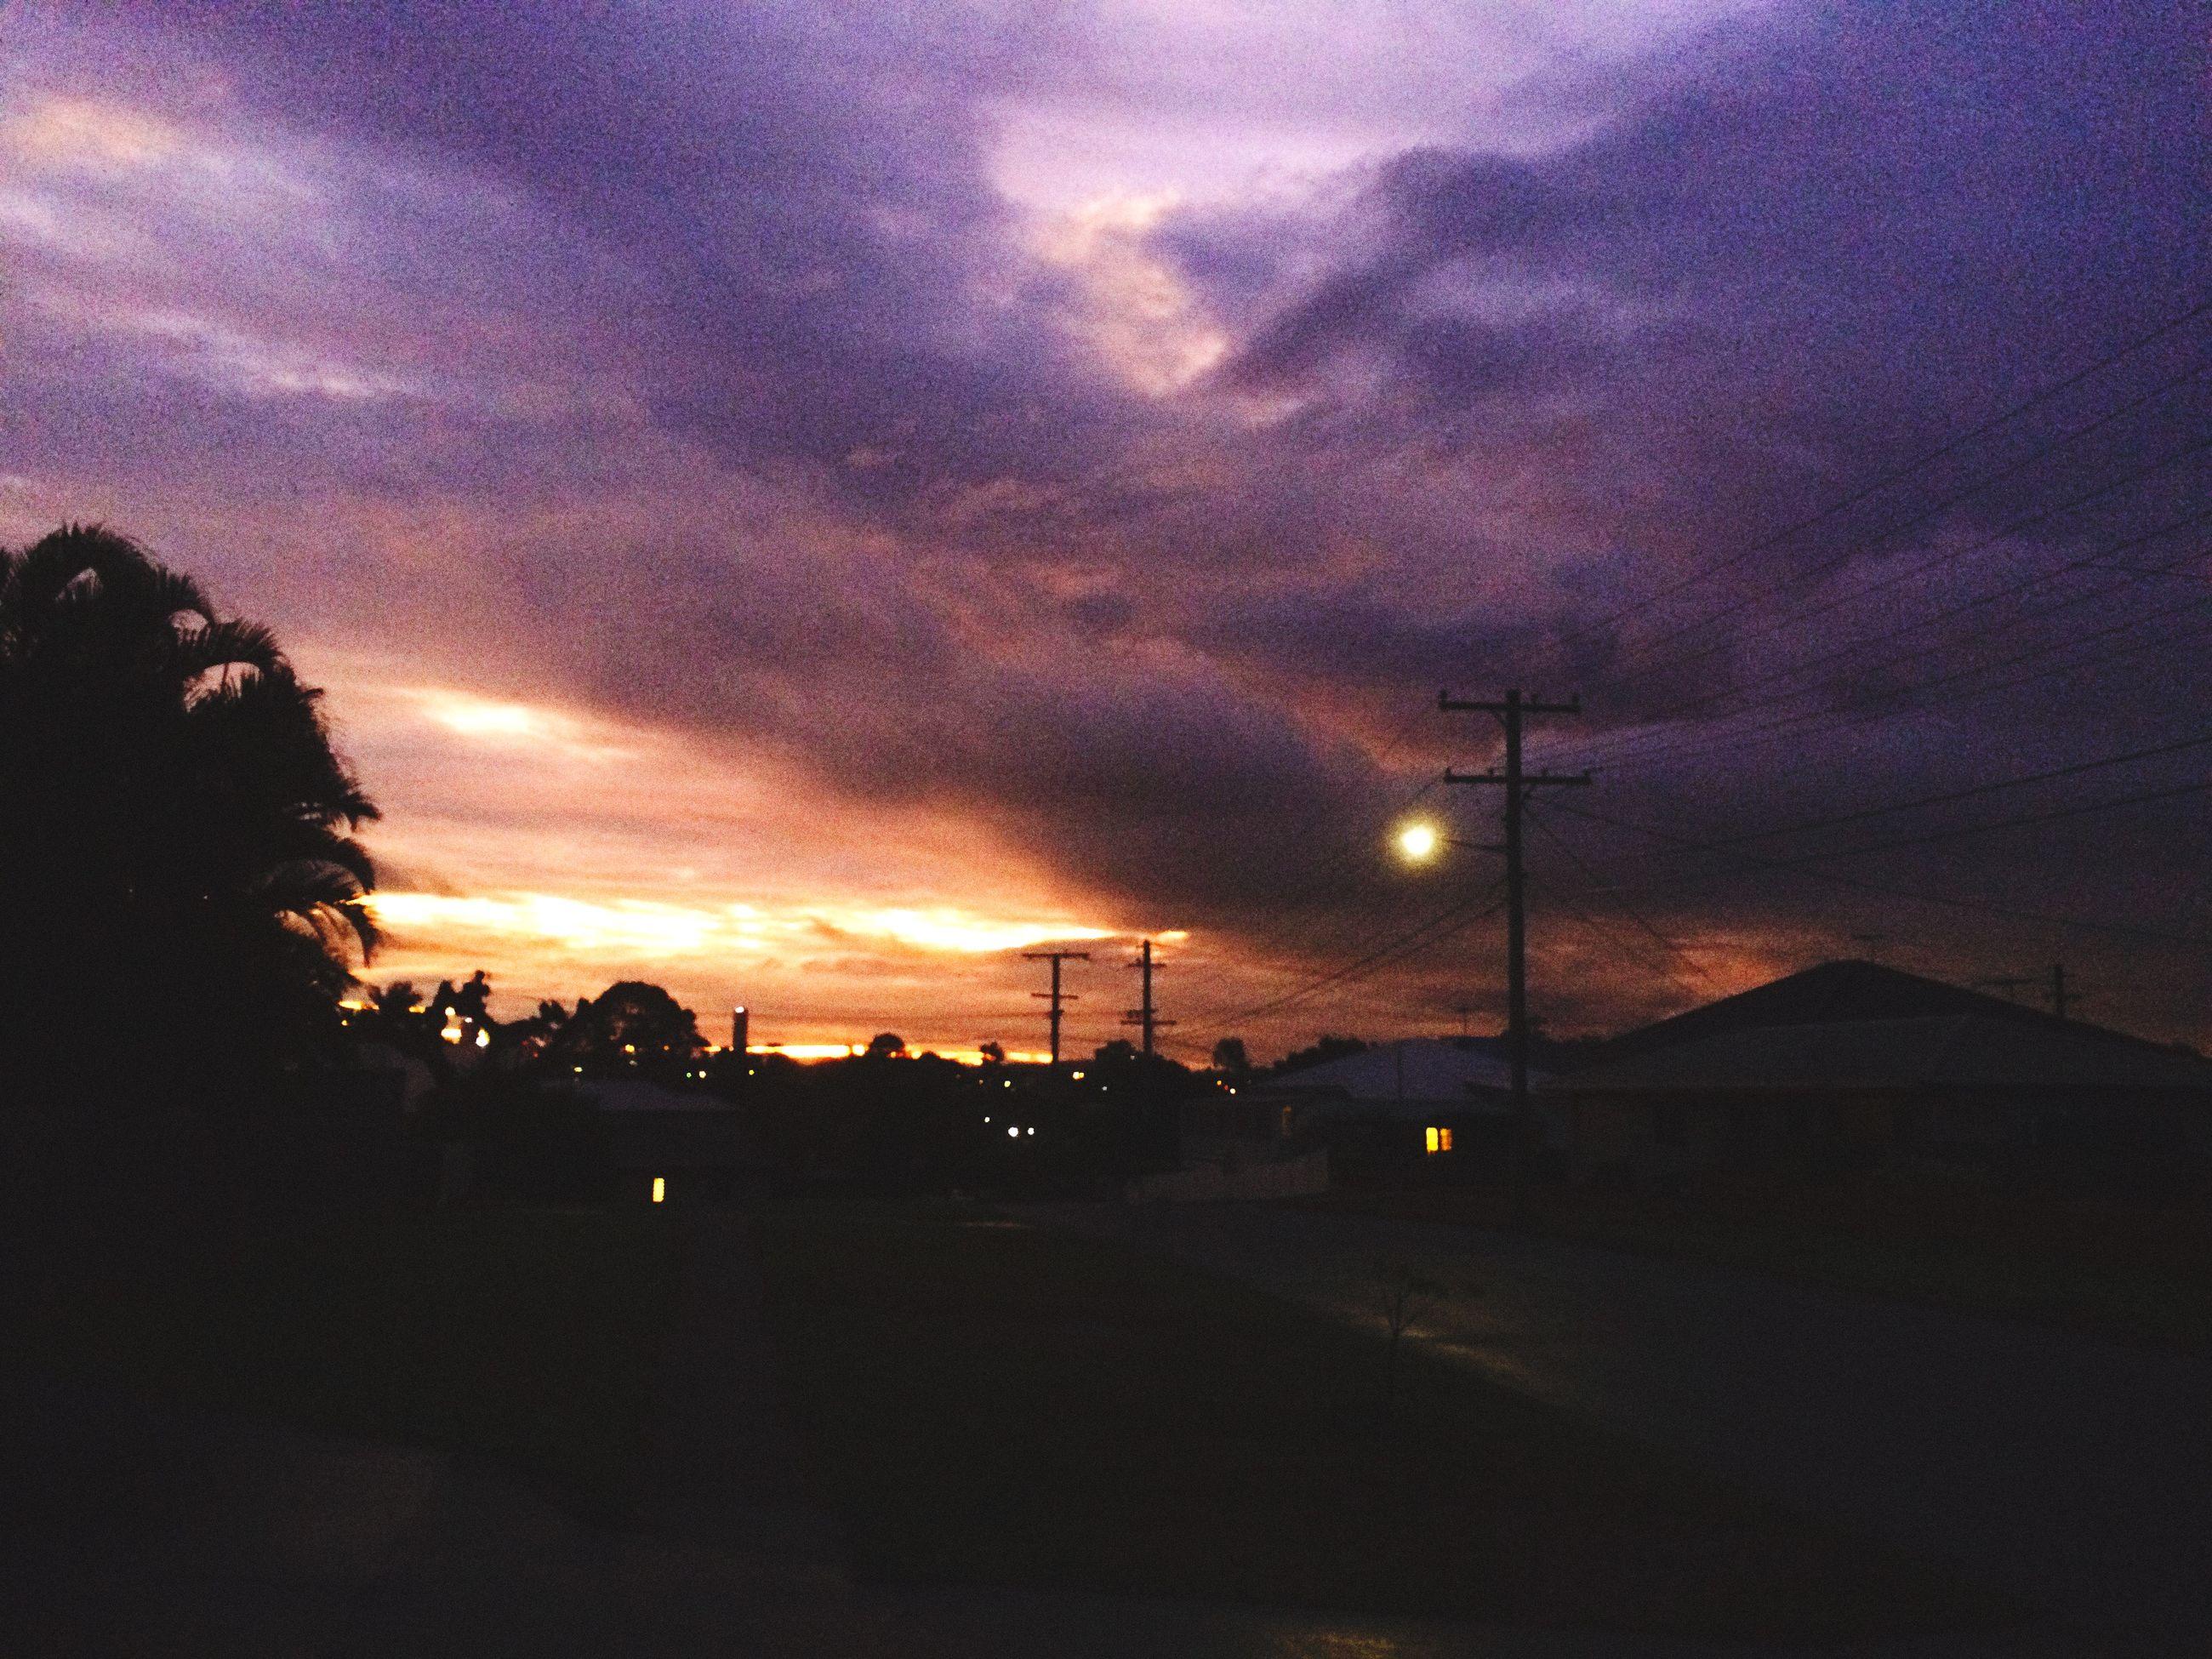 sky, cloud - sky, illuminated, night, silhouette, cloudy, sunset, storm cloud, dramatic sky, building exterior, road, street light, weather, street, dusk, transportation, overcast, car, built structure, city